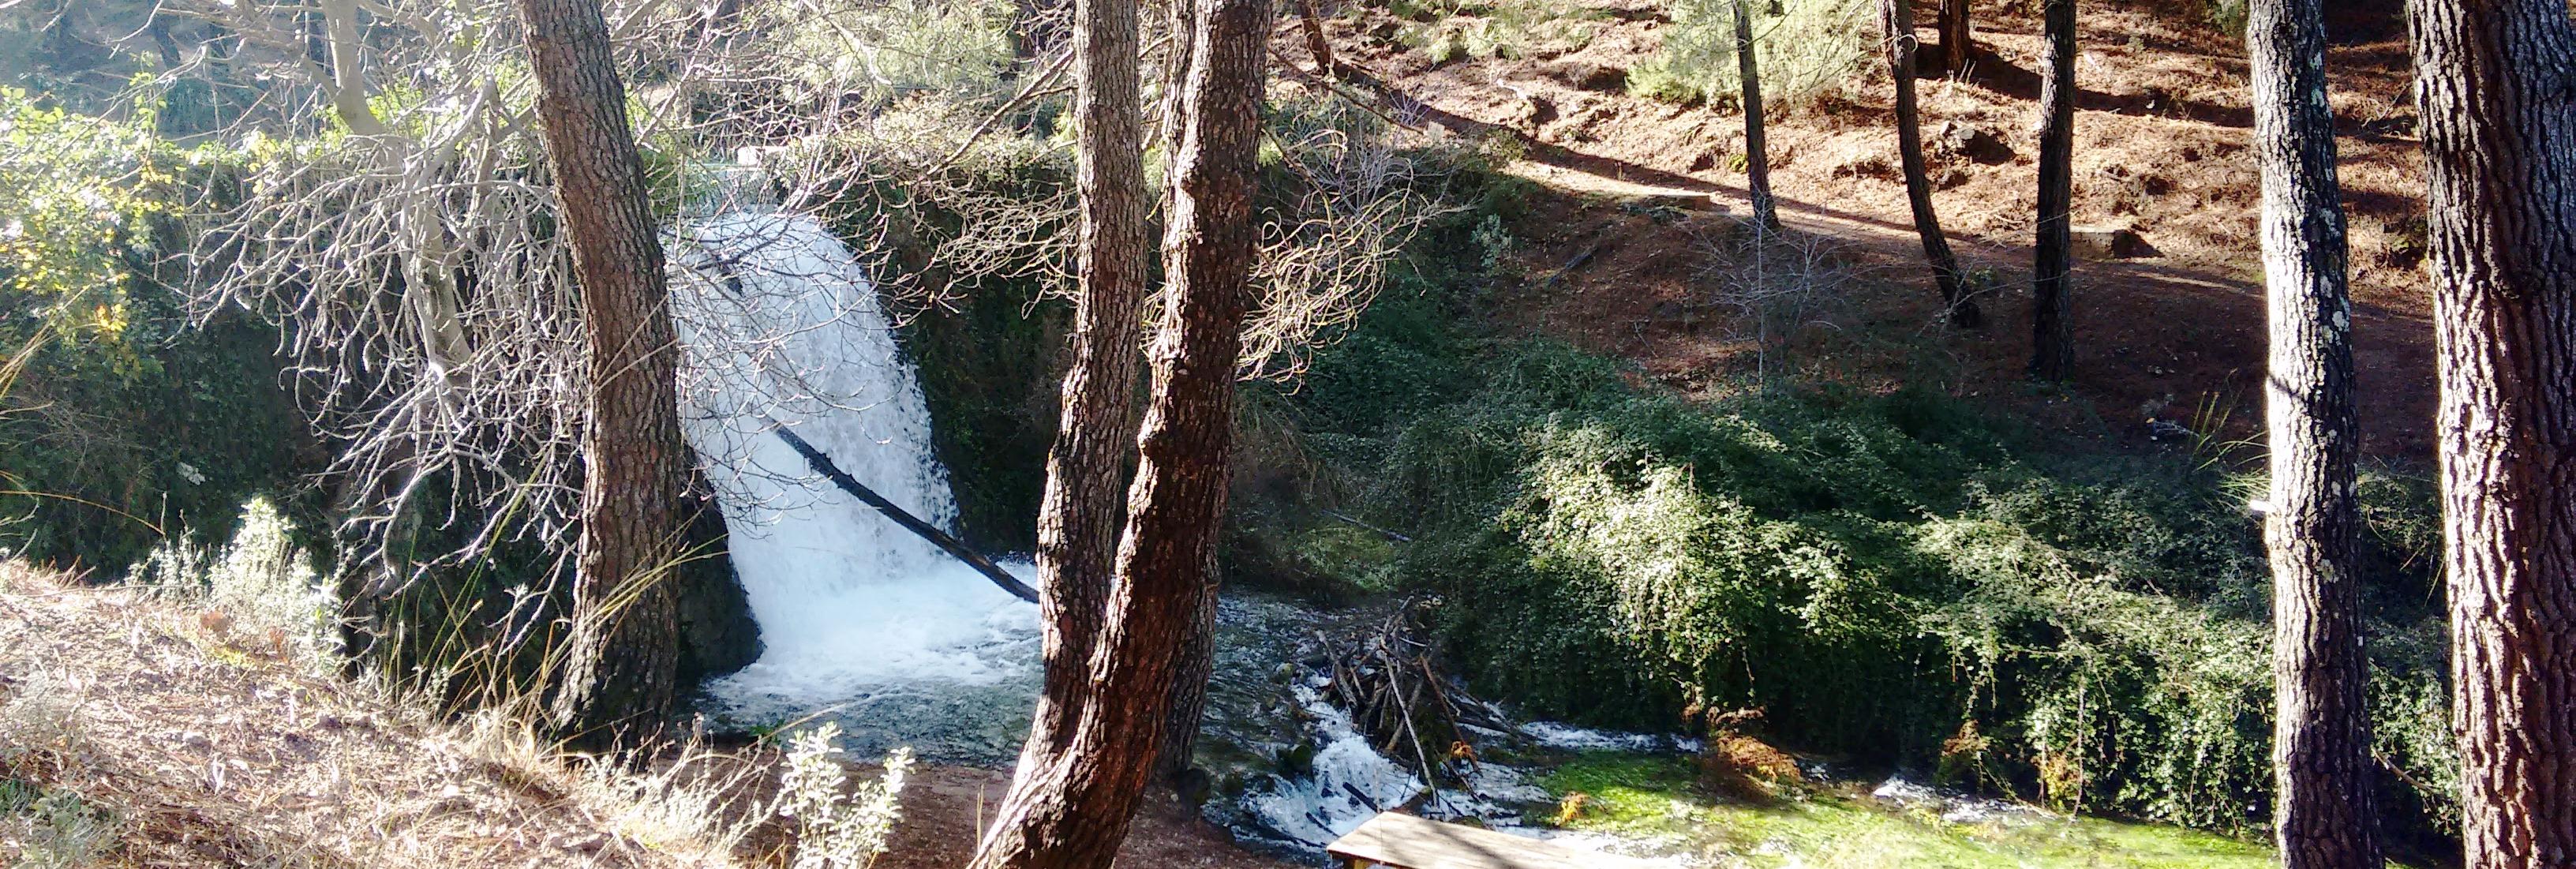 Antigua represa naturalizada